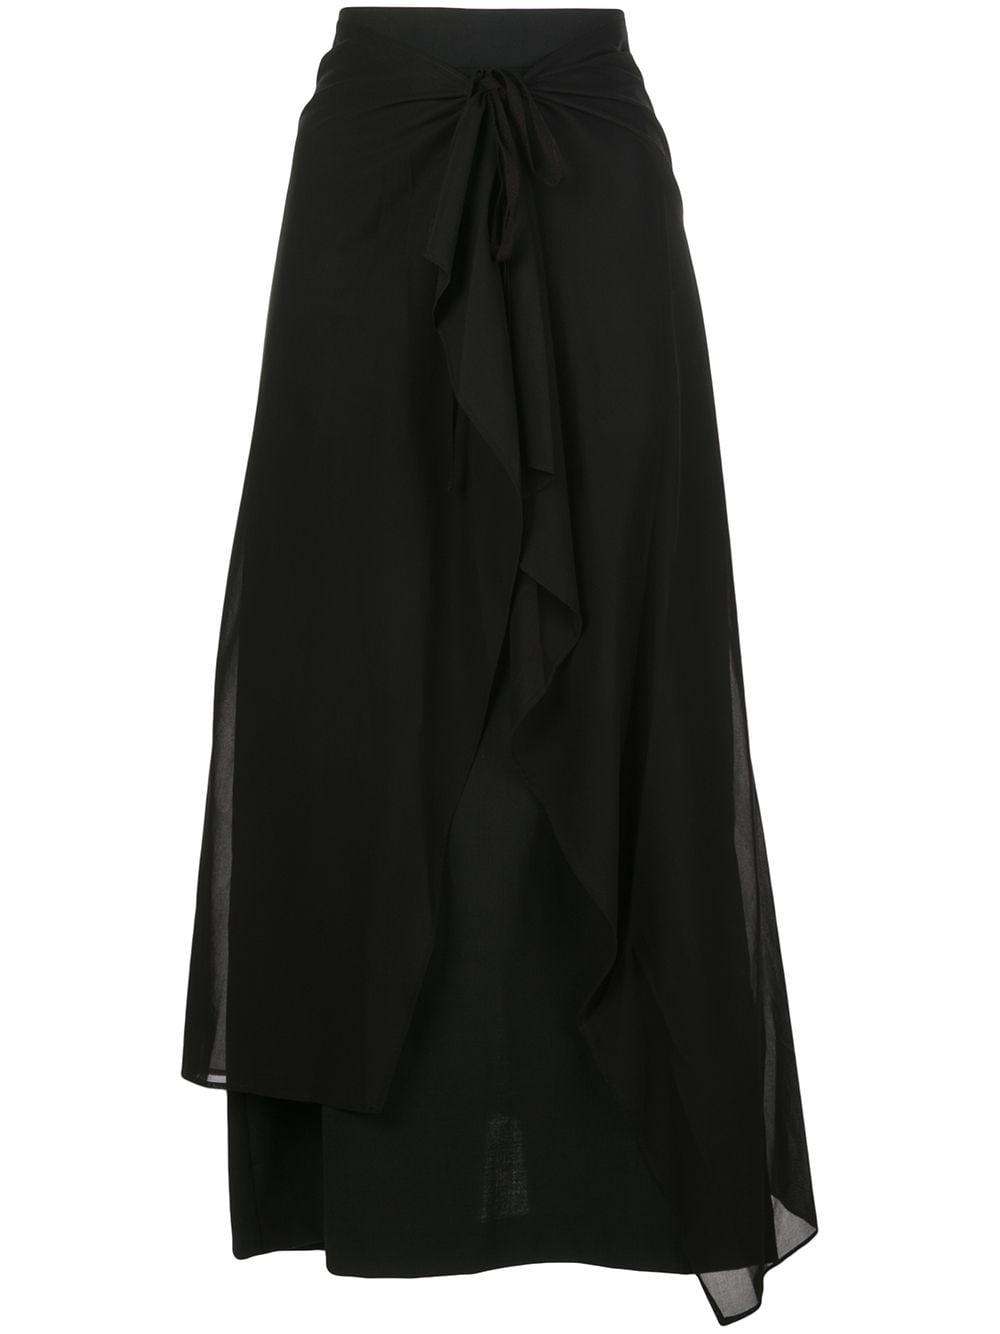 Y's юбка с завязкой спереди